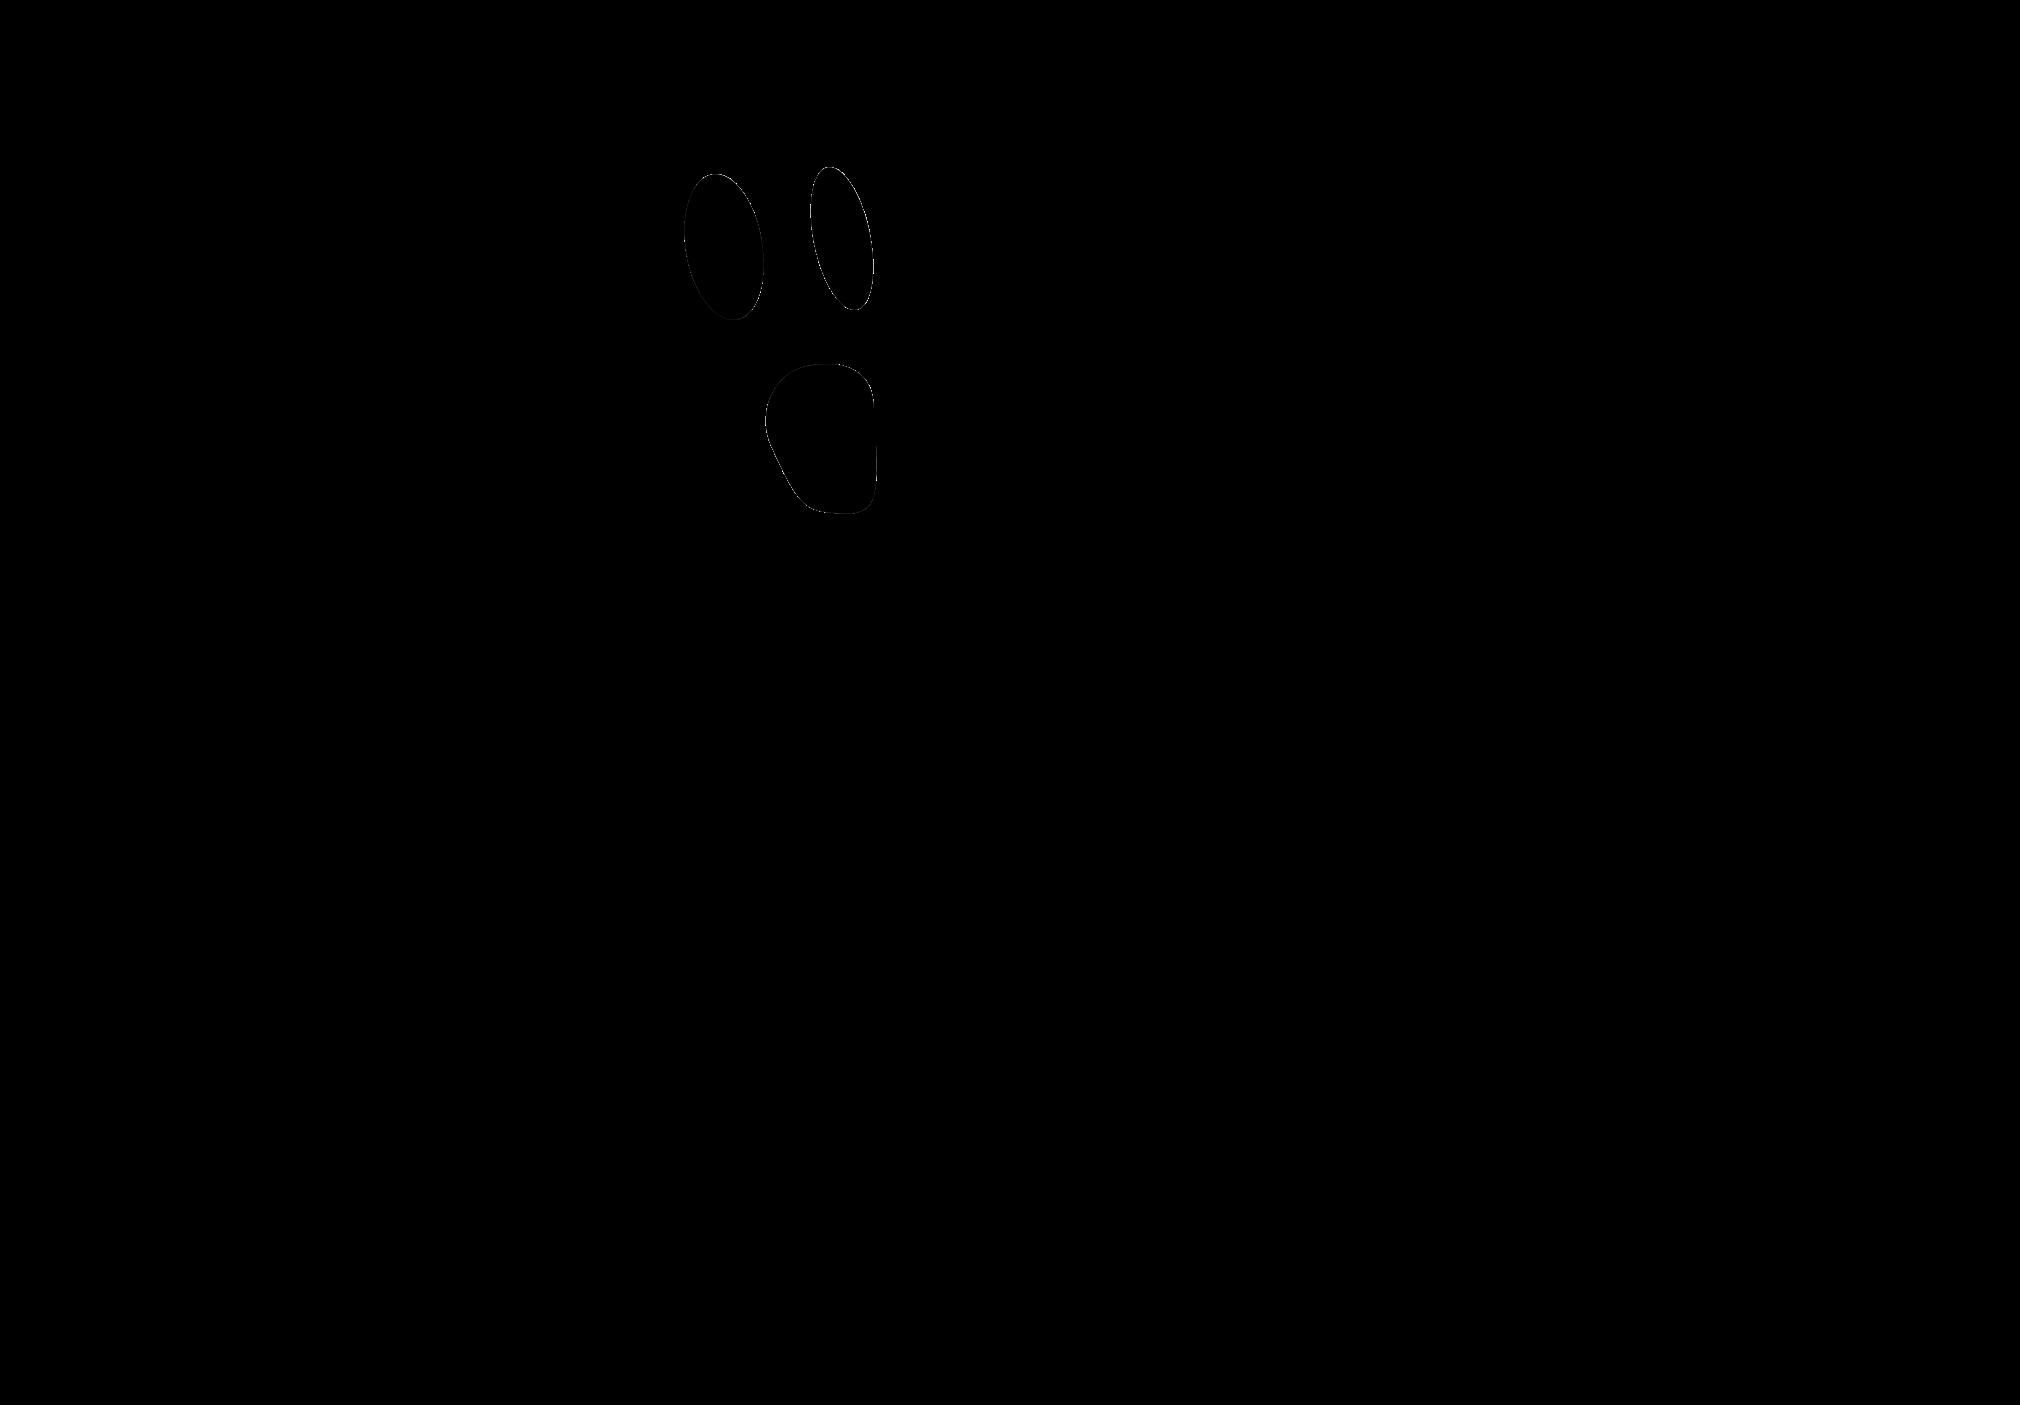 Ghost Clip Art-Ghost Clip Art-5